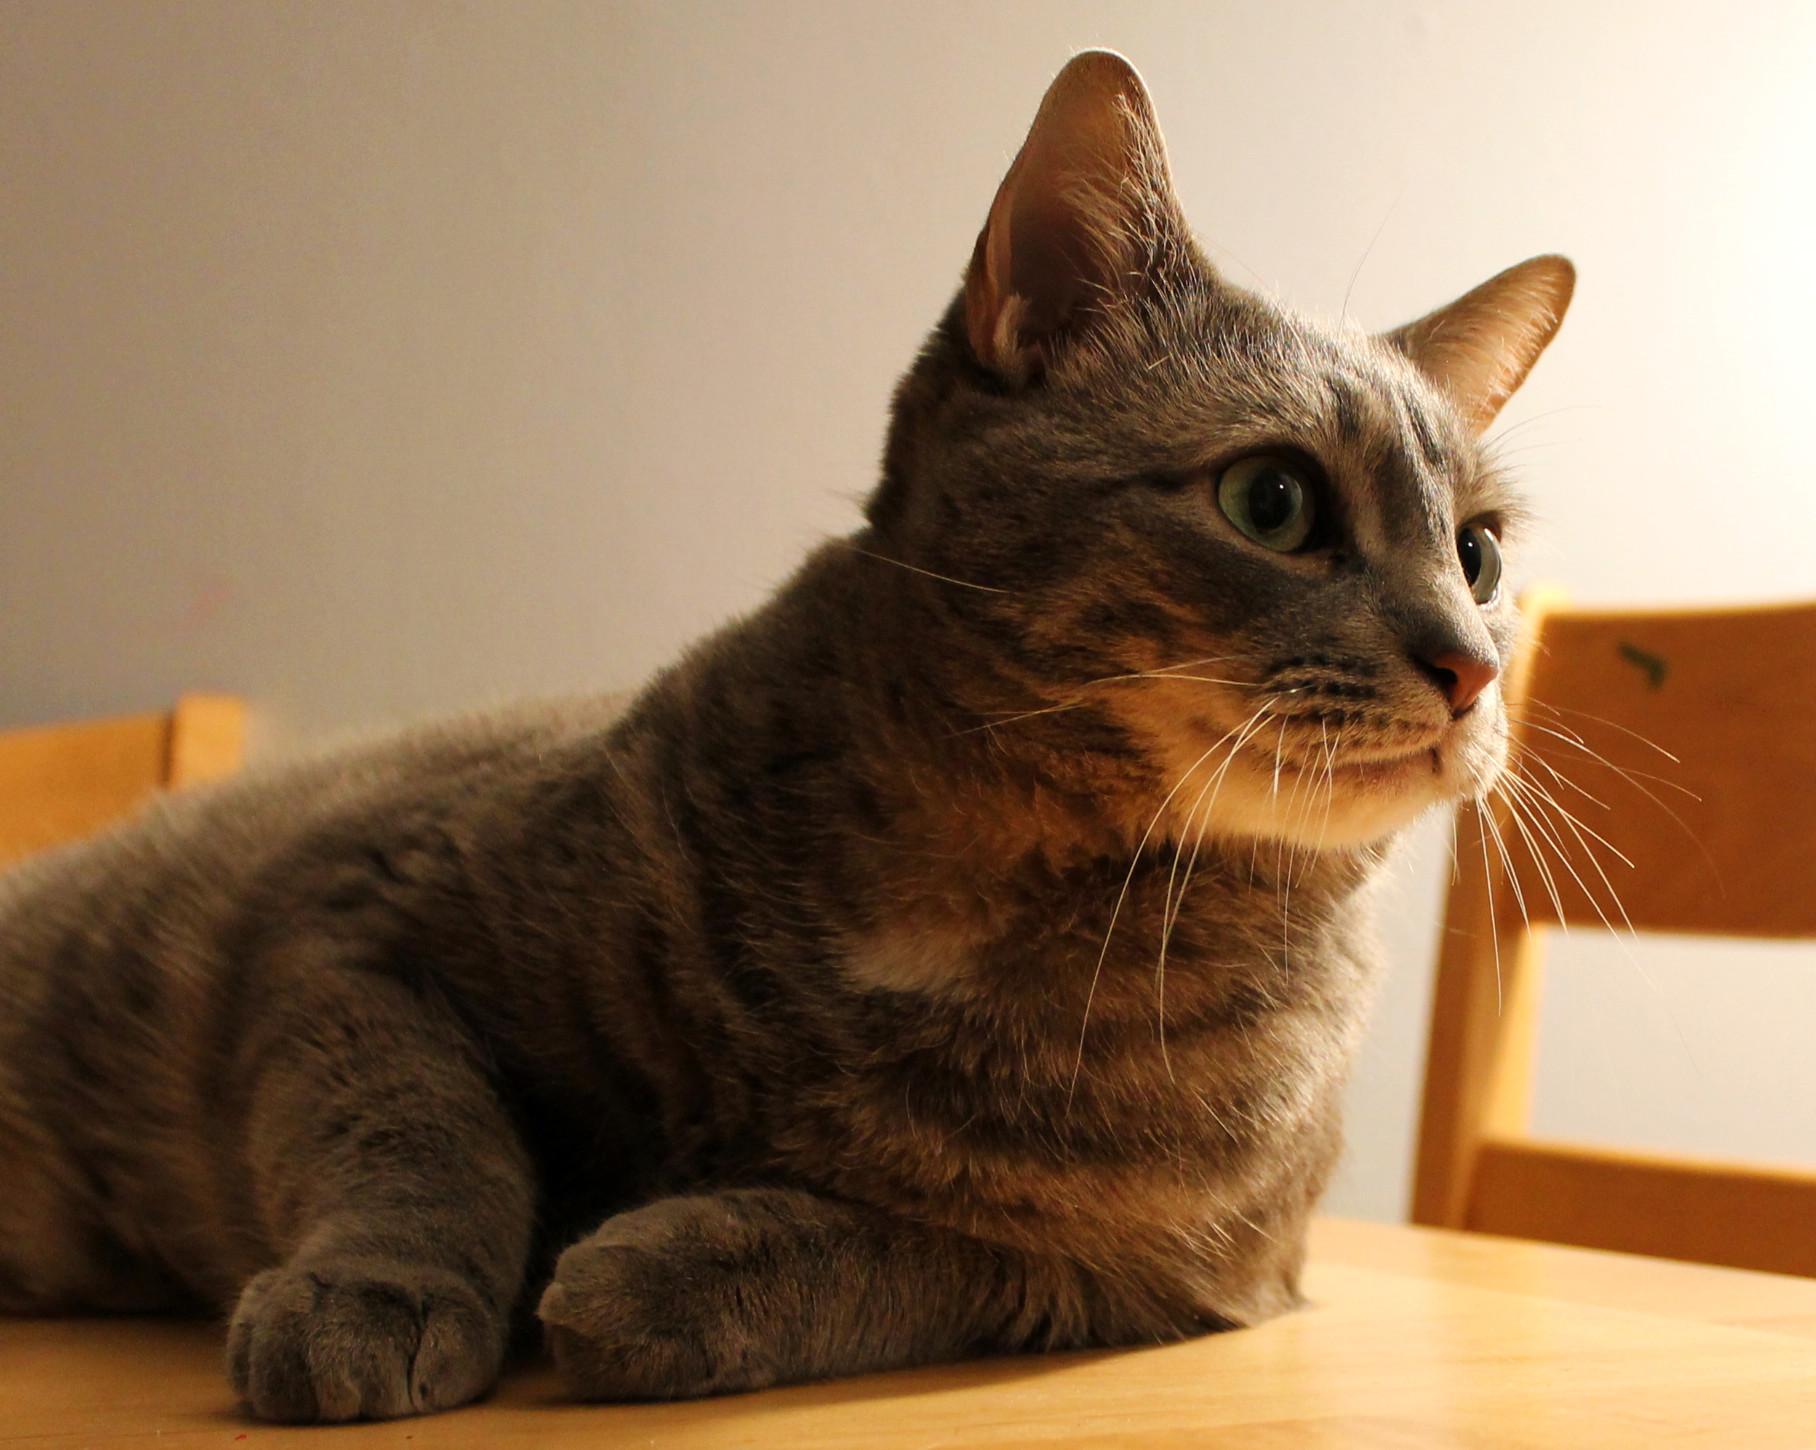 Buddy on a table